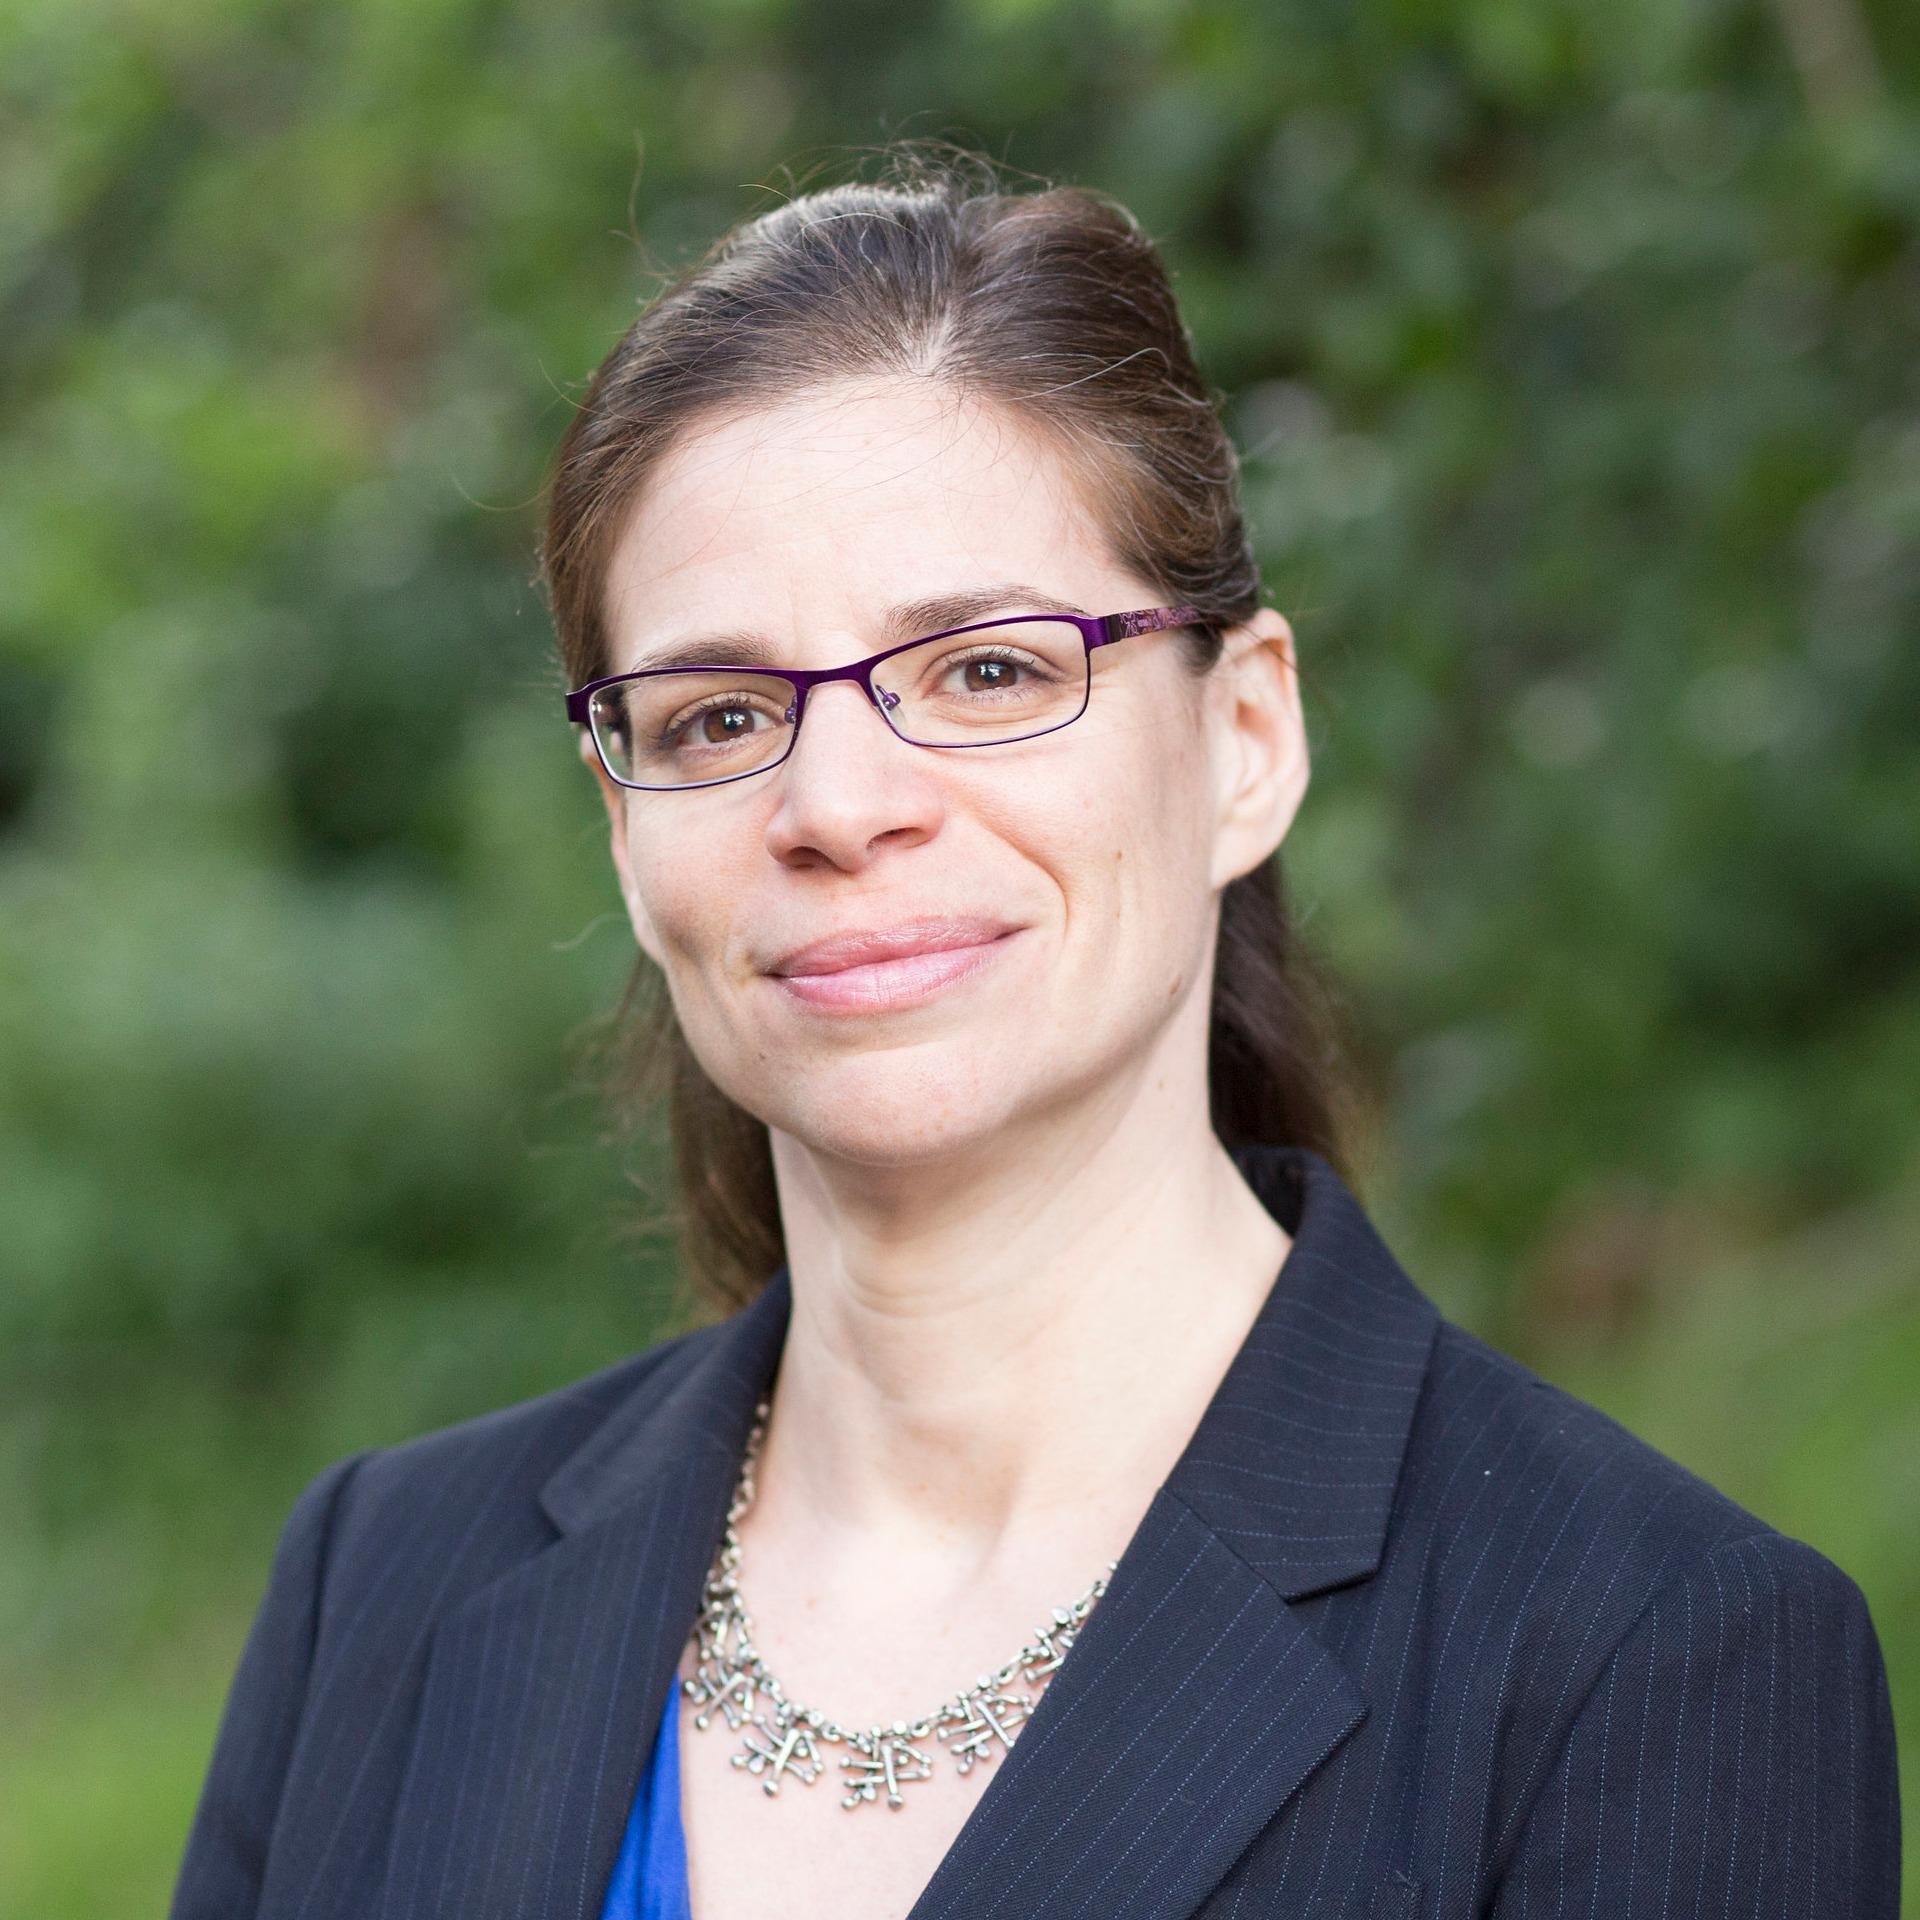 Assistant Professor Ariel H Bierbaum